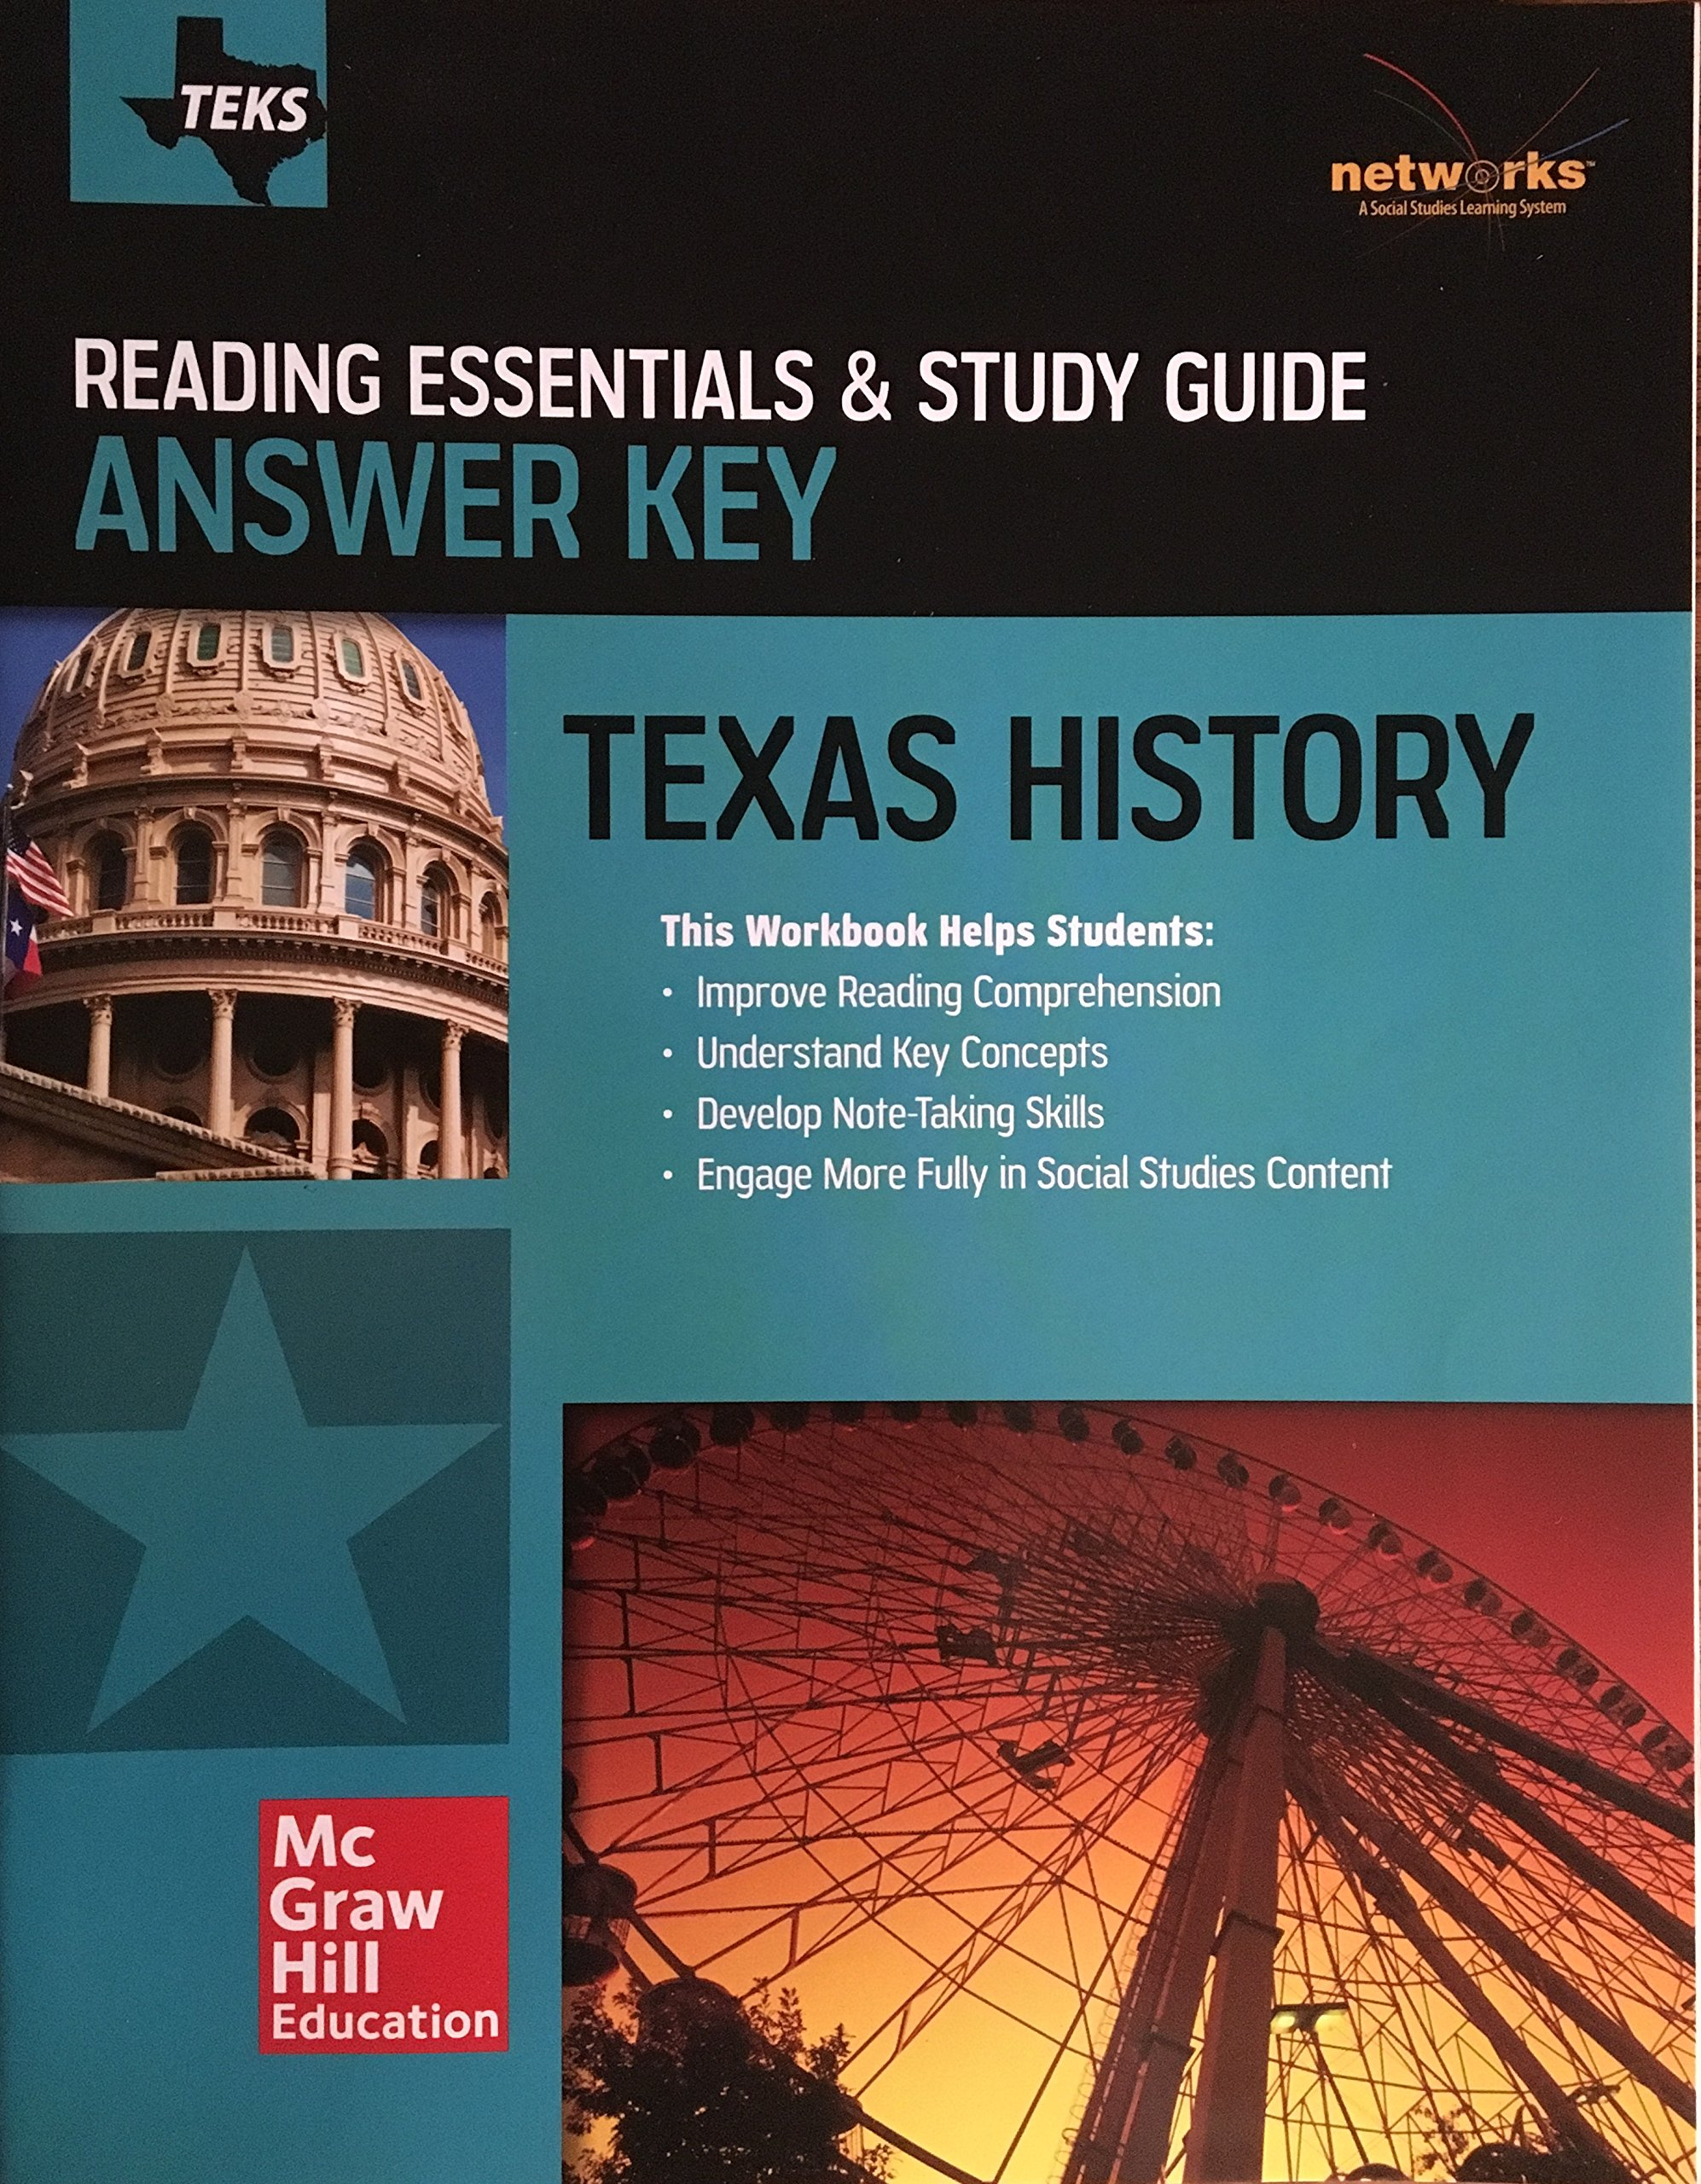 Teks texas history reading essentials study guide answer key teks texas history reading essentials study guide answer key mcgraw hill 9780021360574 amazon books fandeluxe Images